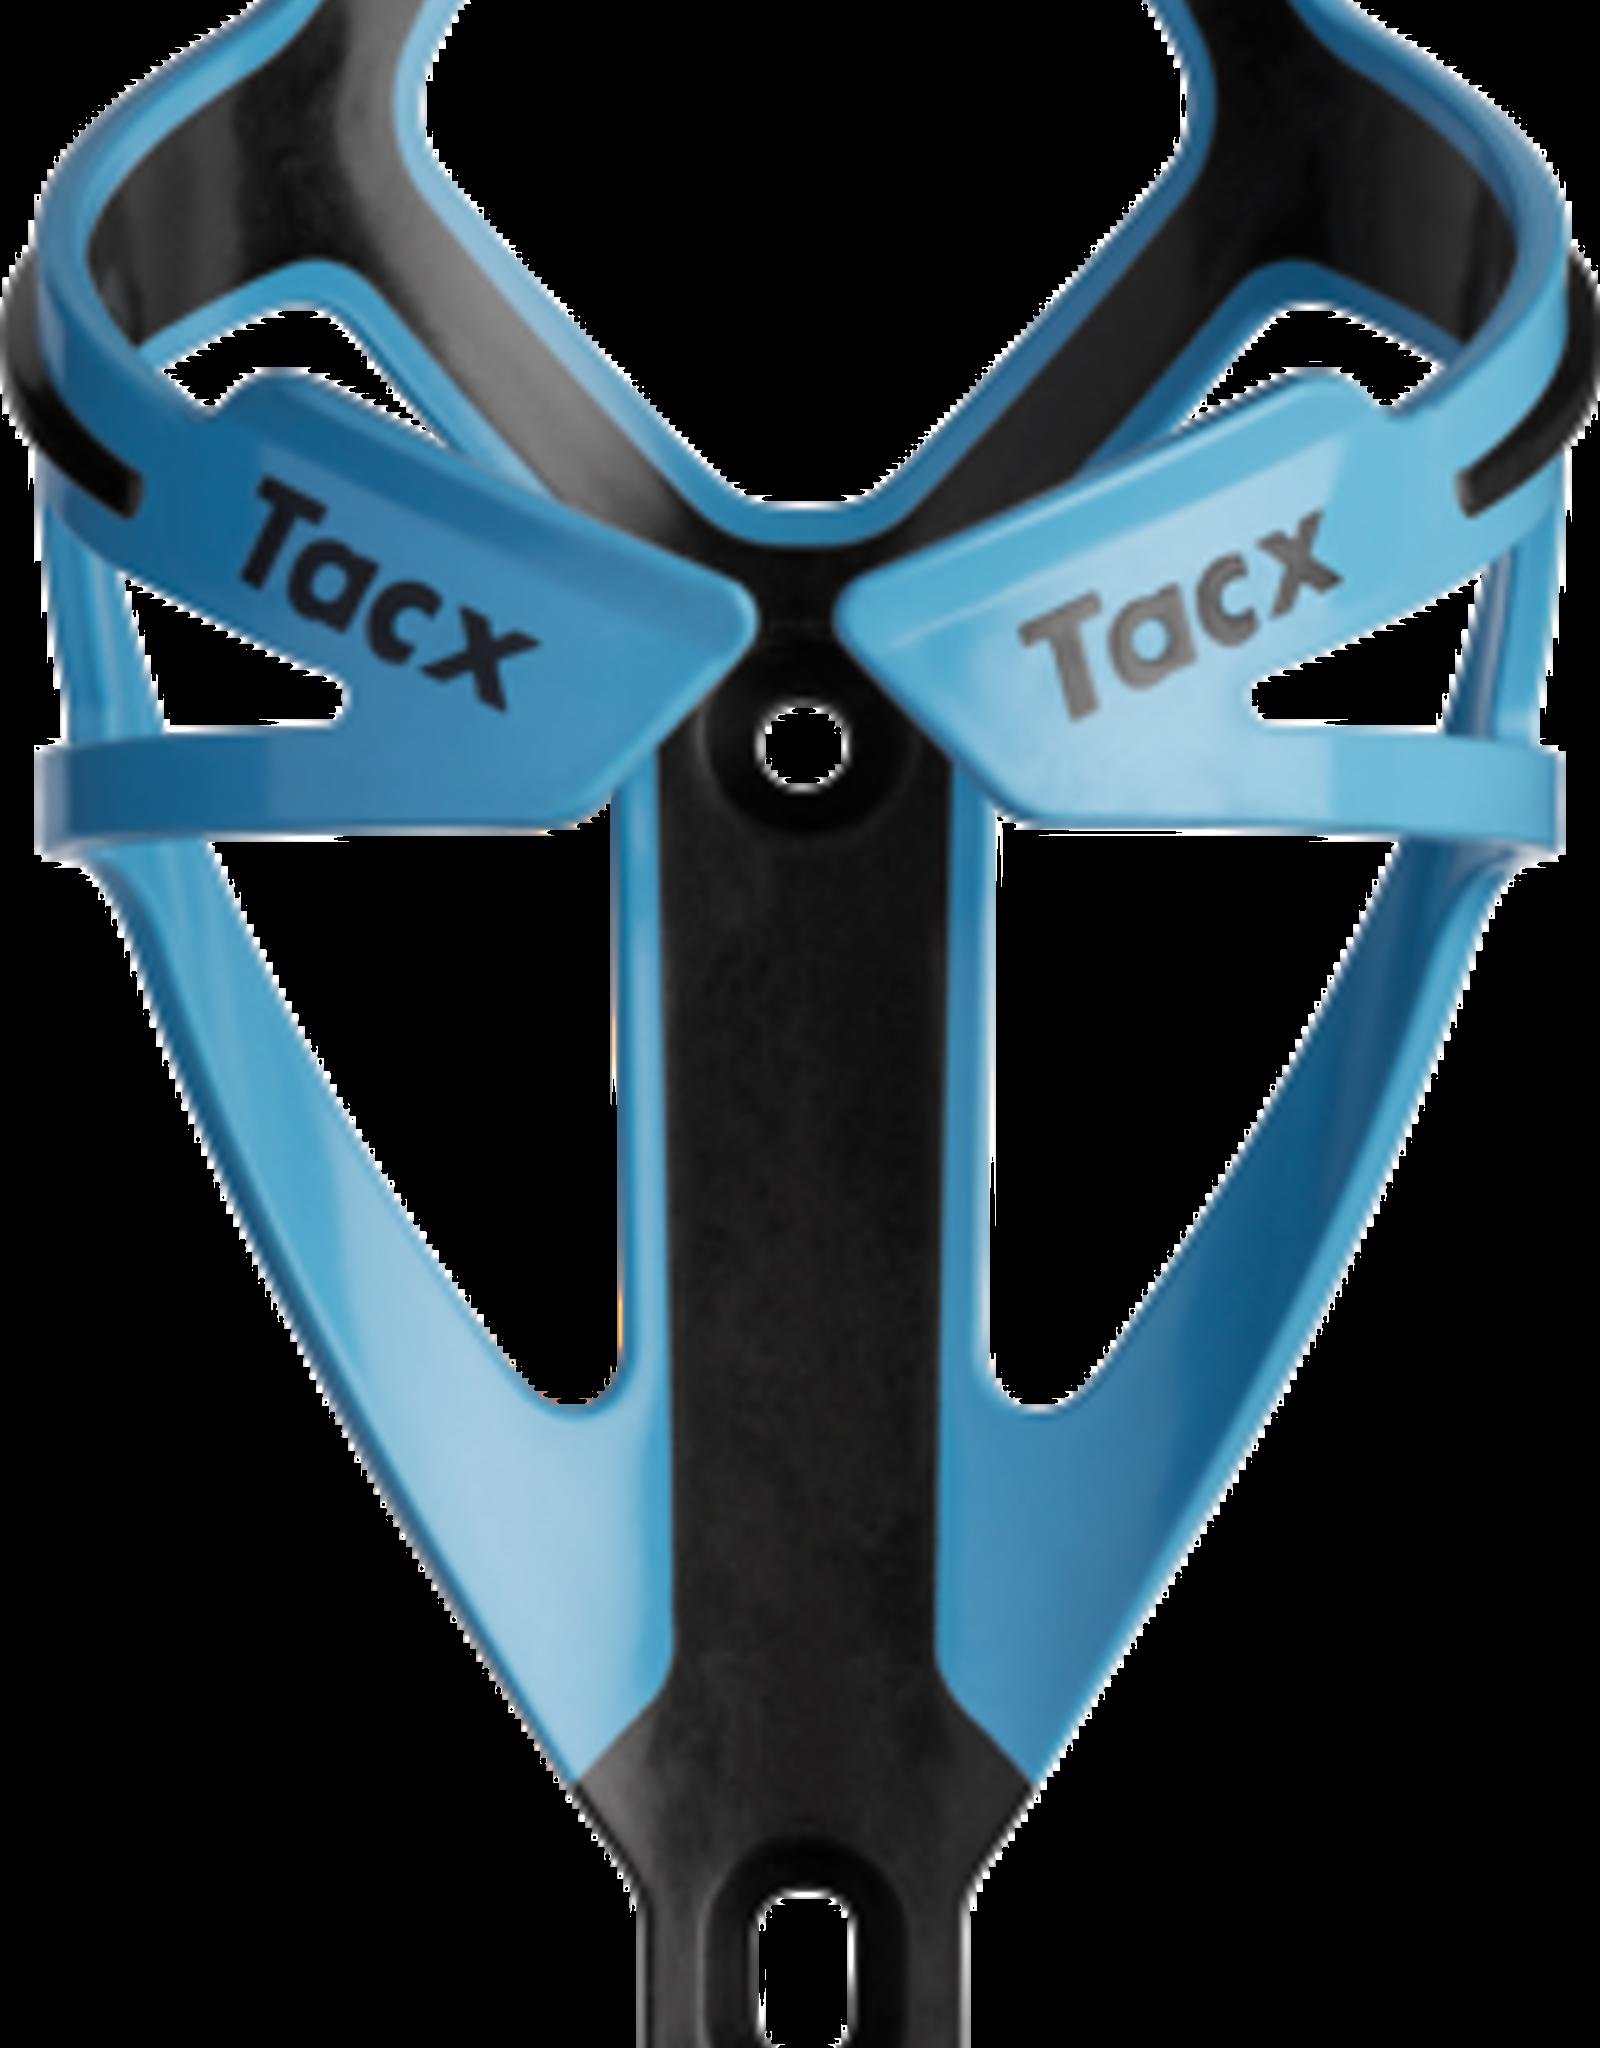 TACX TACX DEVA BOTTLE CAGE LIGHT BLUE